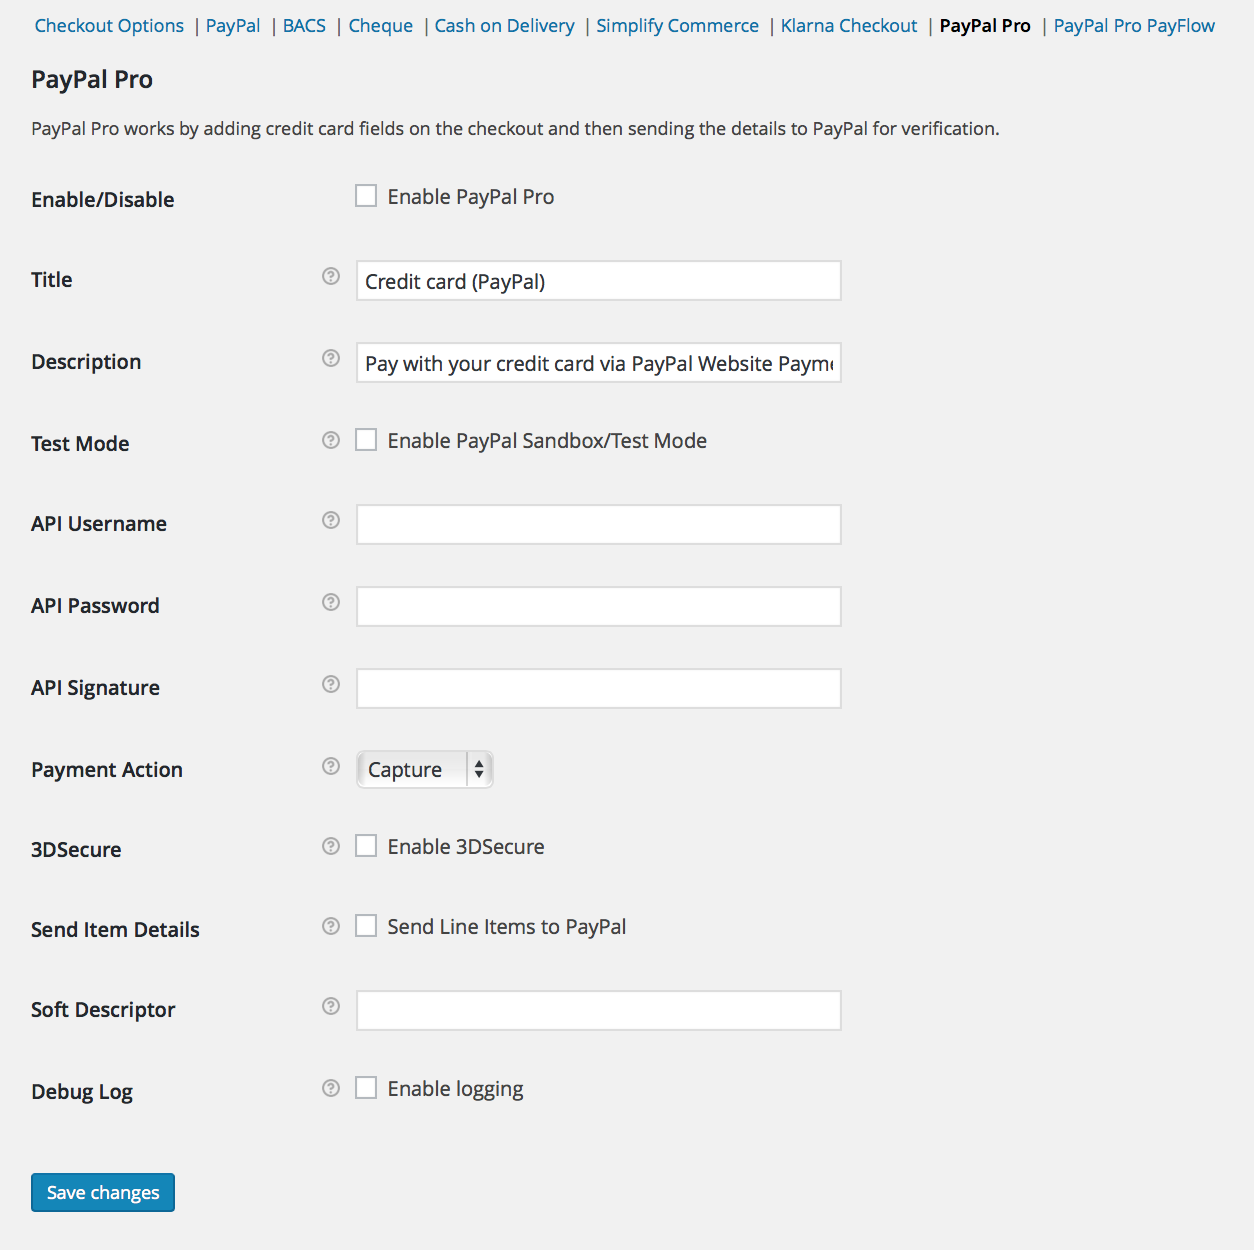 paypal pro settings